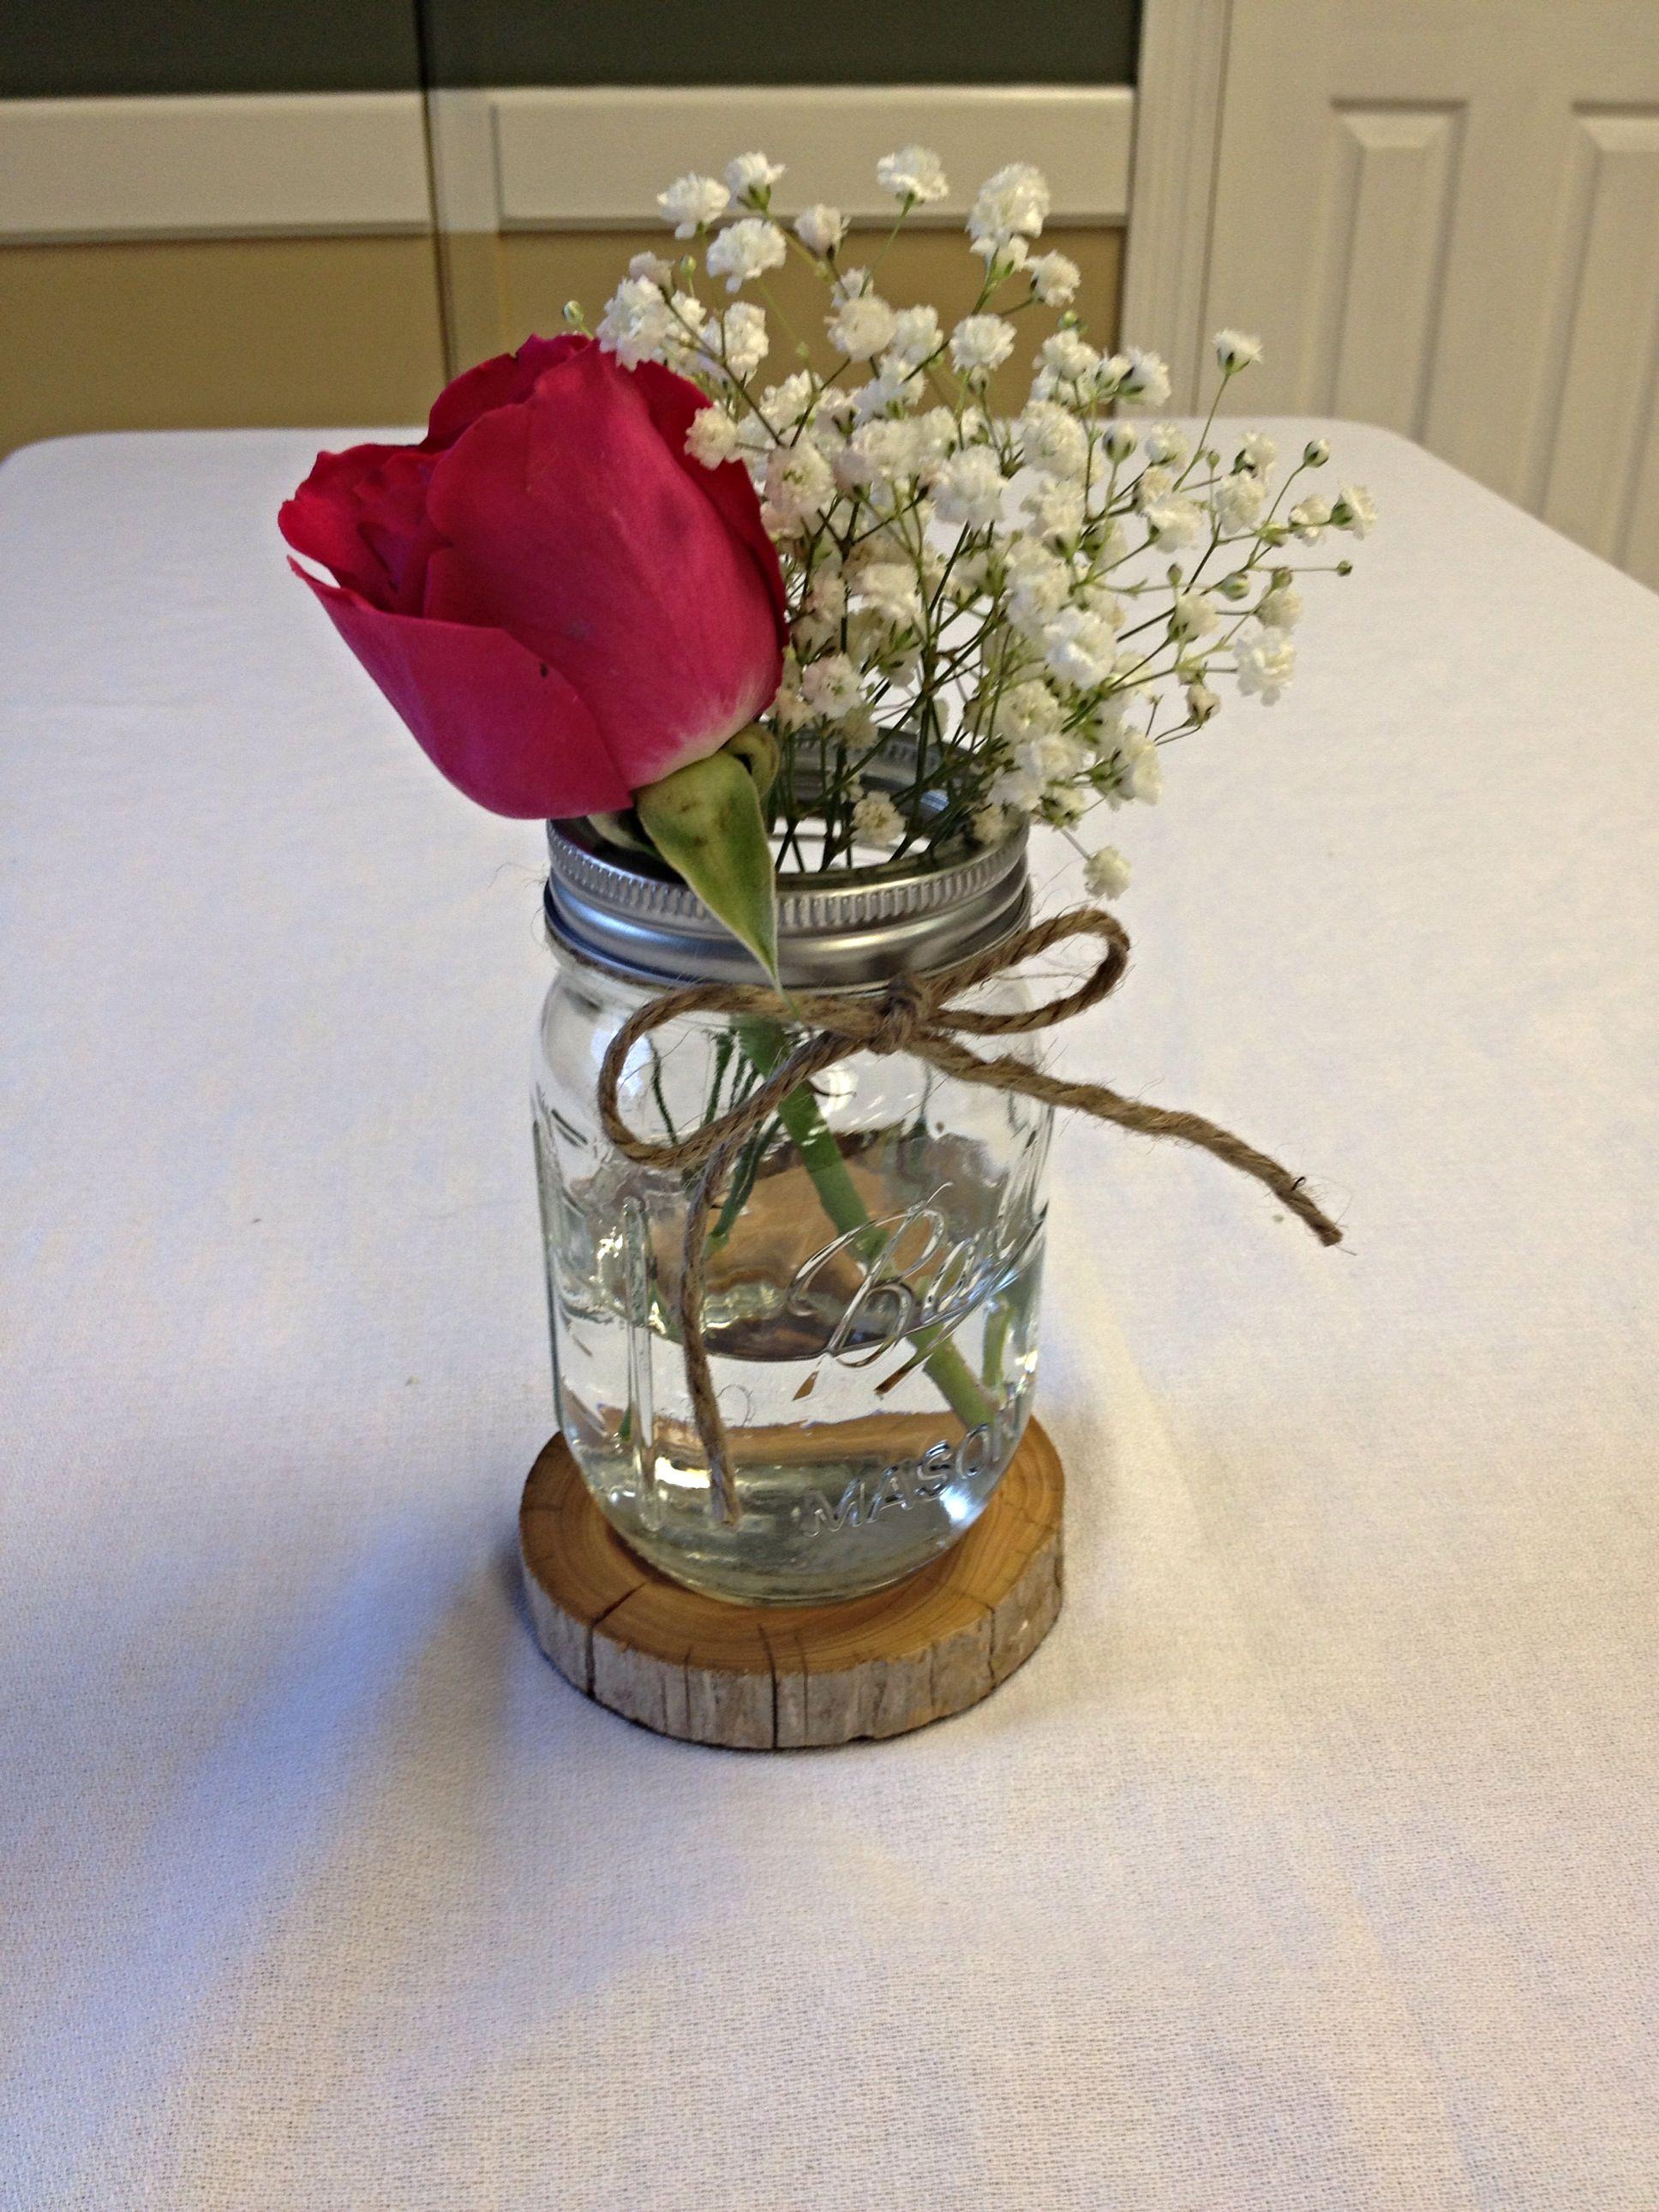 Rose Babies Breath Mason Jar Cedar Coaster Red Roses Centerpieces Sunflower Wedding Centerpieces Mason Jar Centerpieces